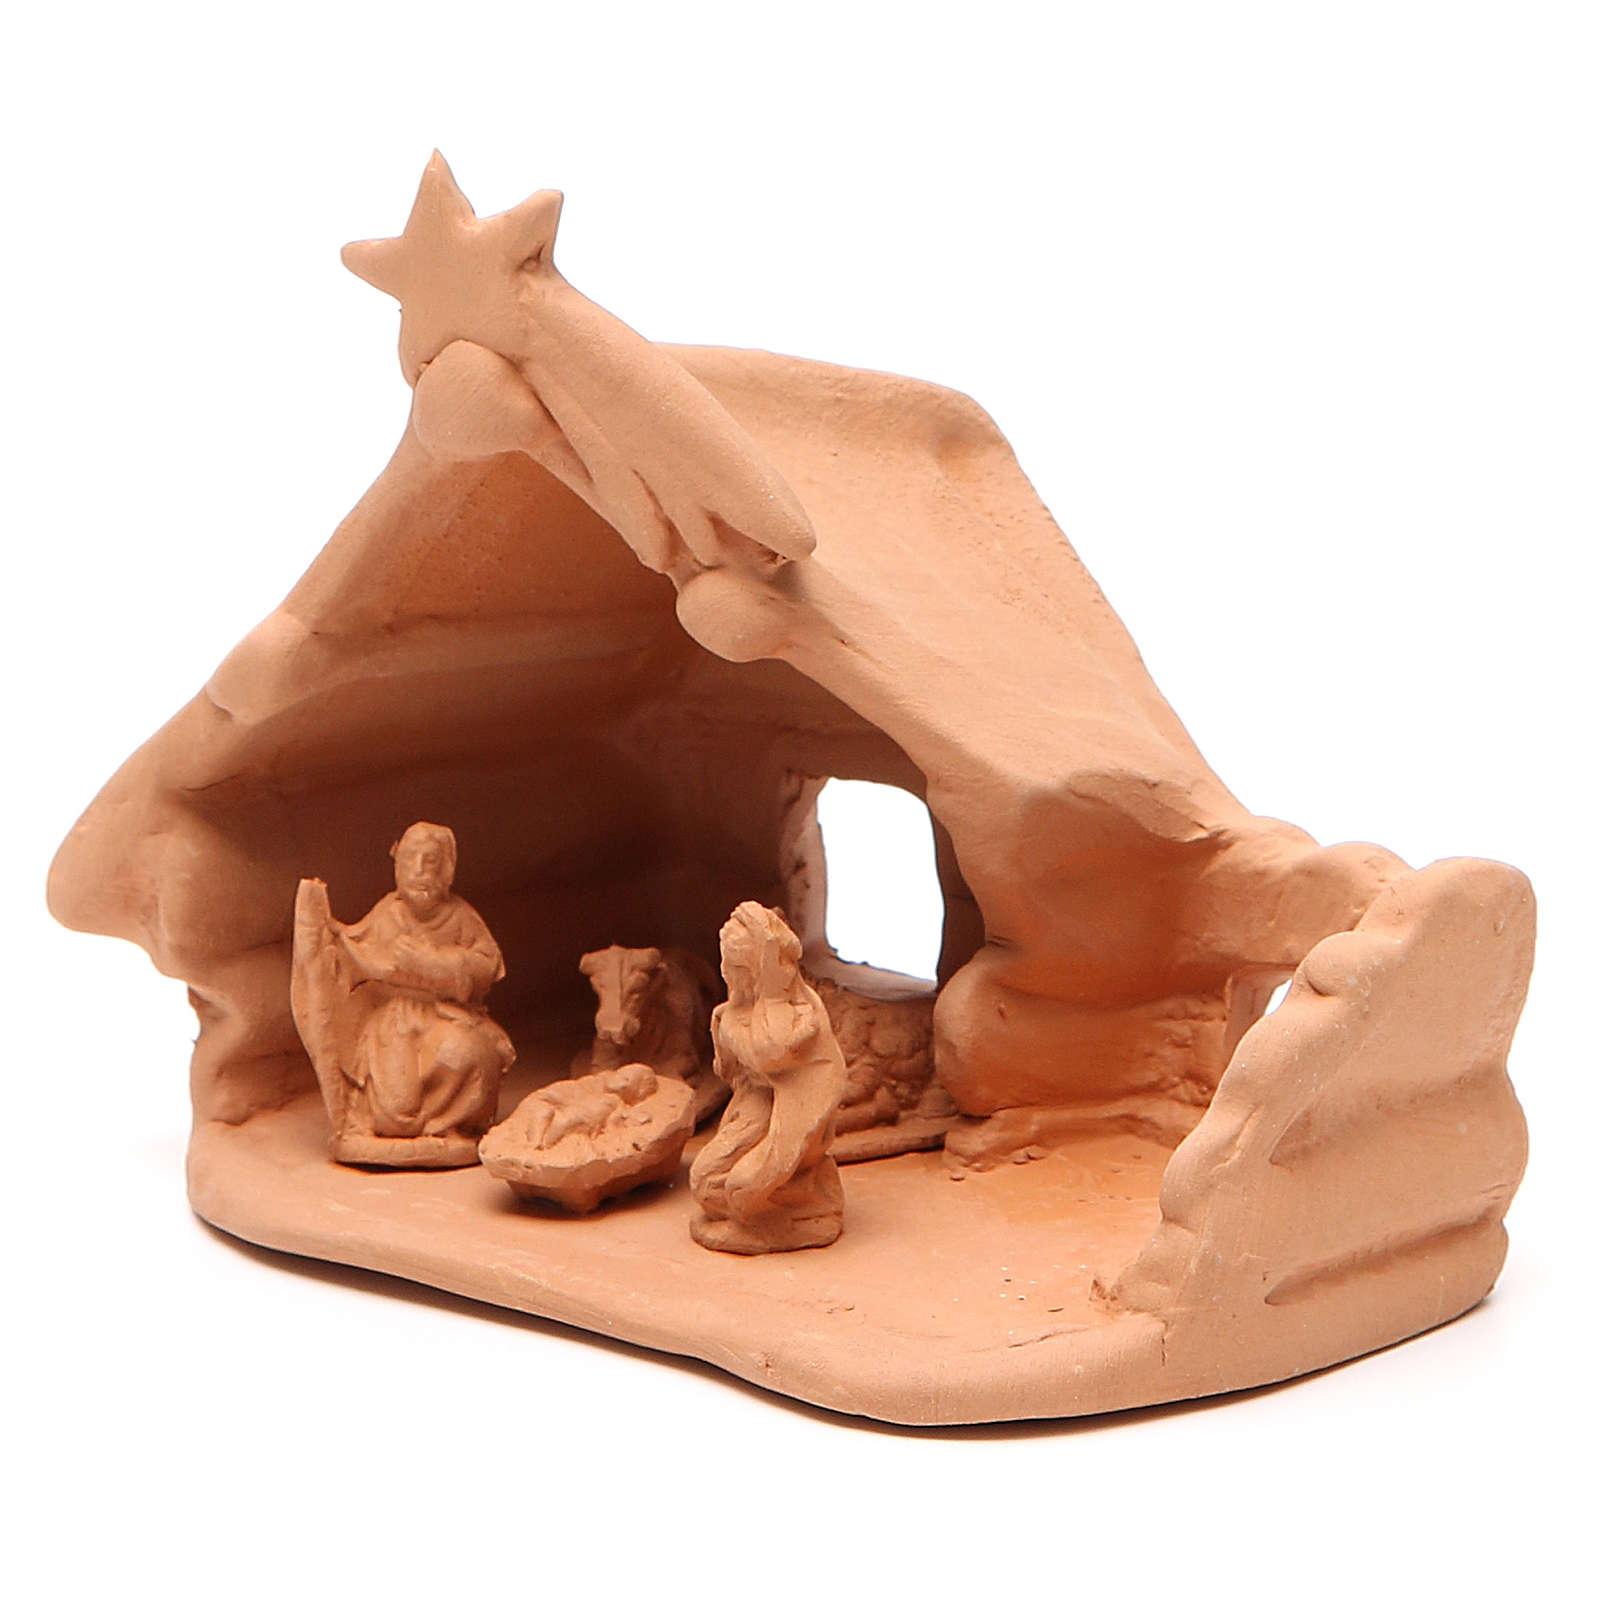 Święta Rodzina i chata terakota 11x12x7 cm 4